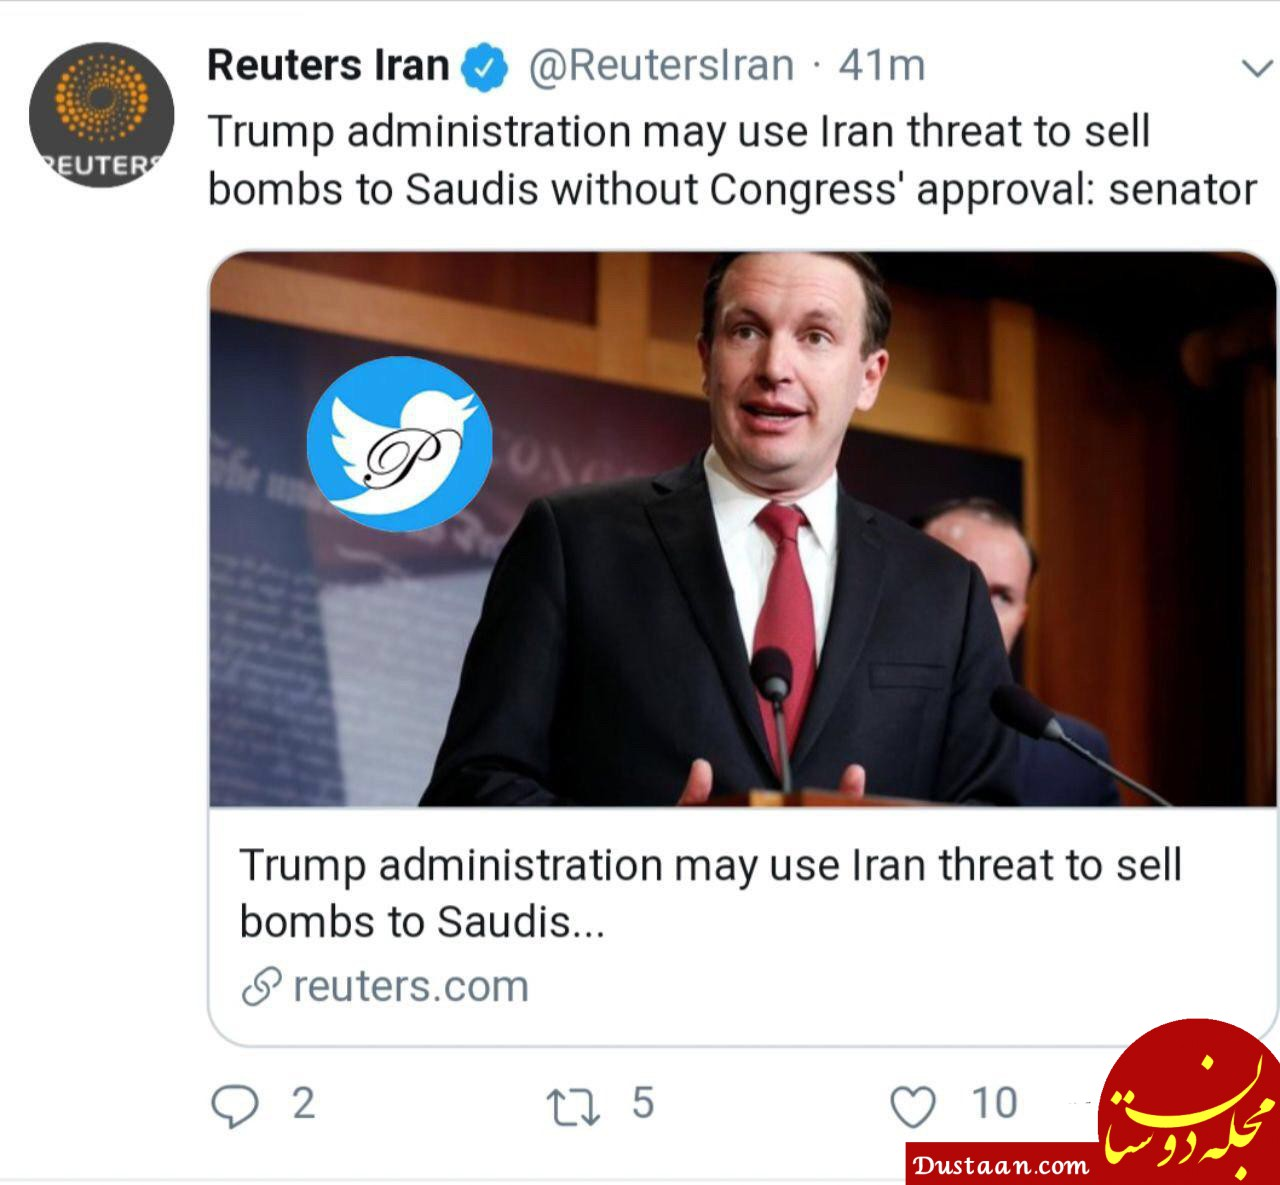 www.dustaan.com ترامپ می خواهد به بهانه تهدید ایران به ریاض بمب بفروشد